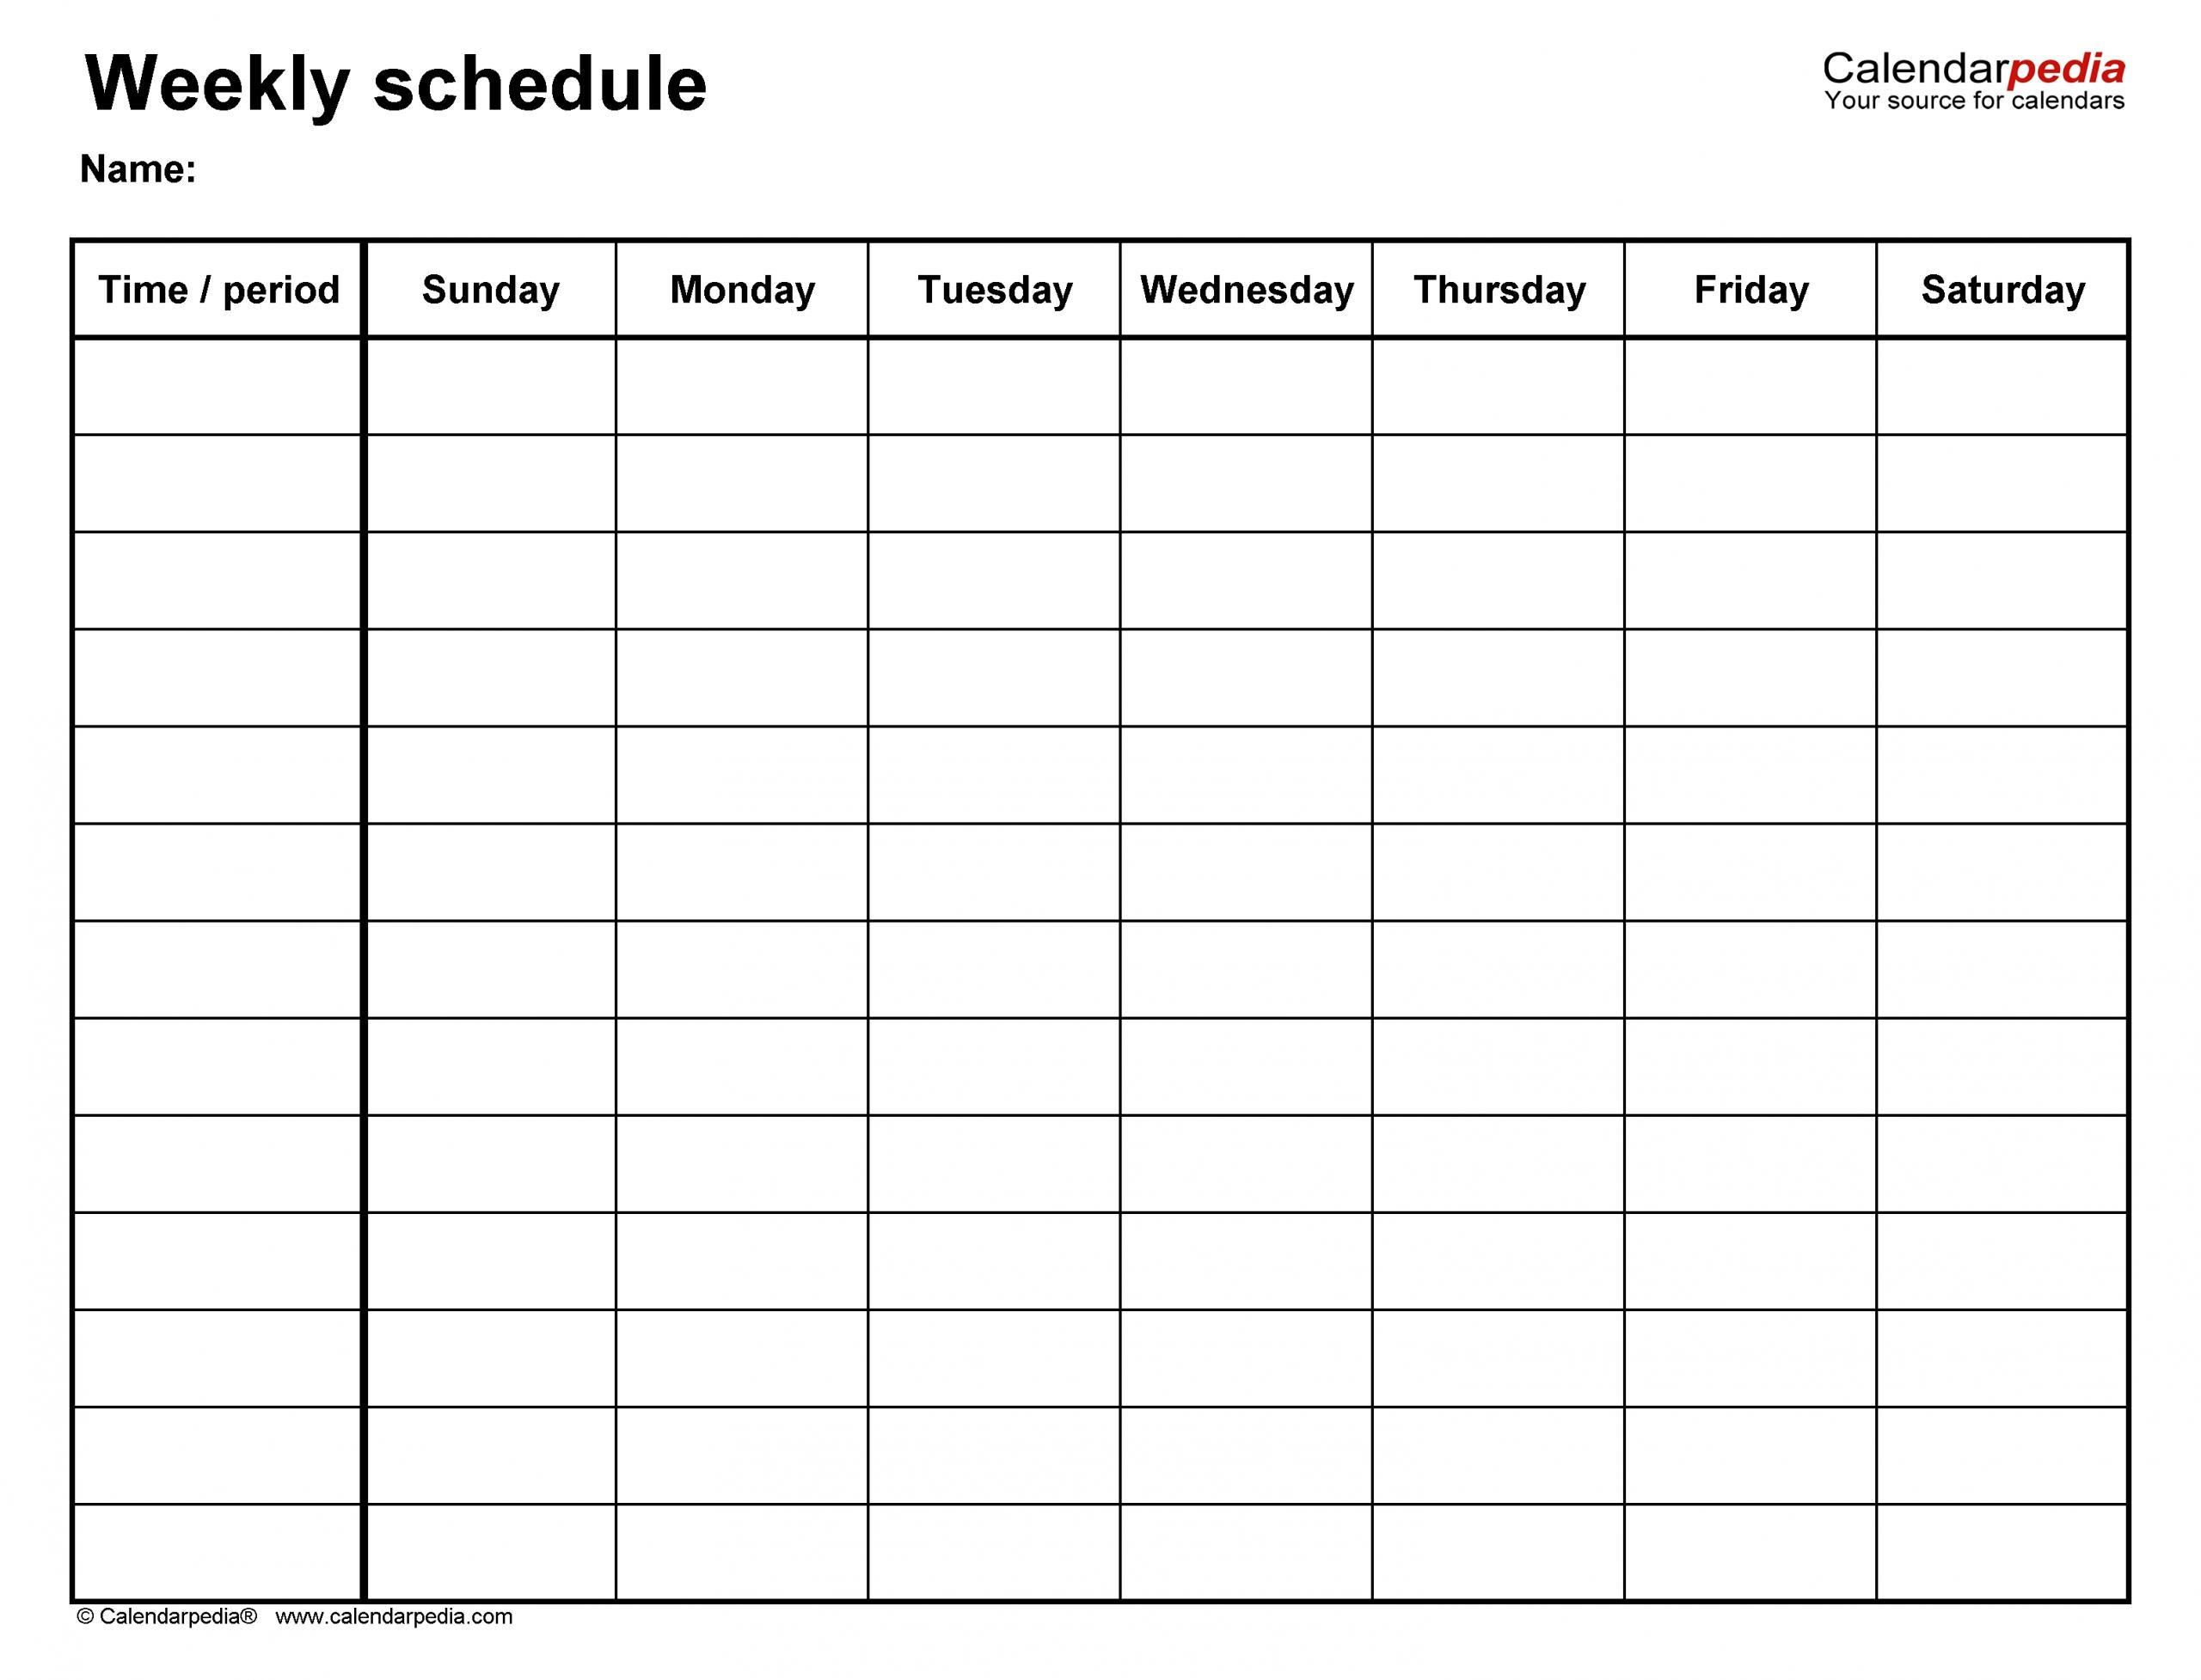 Universal Blank Calendar Grid Moday-Friday | Get Your Blank Calendar Grid Moday-Friday